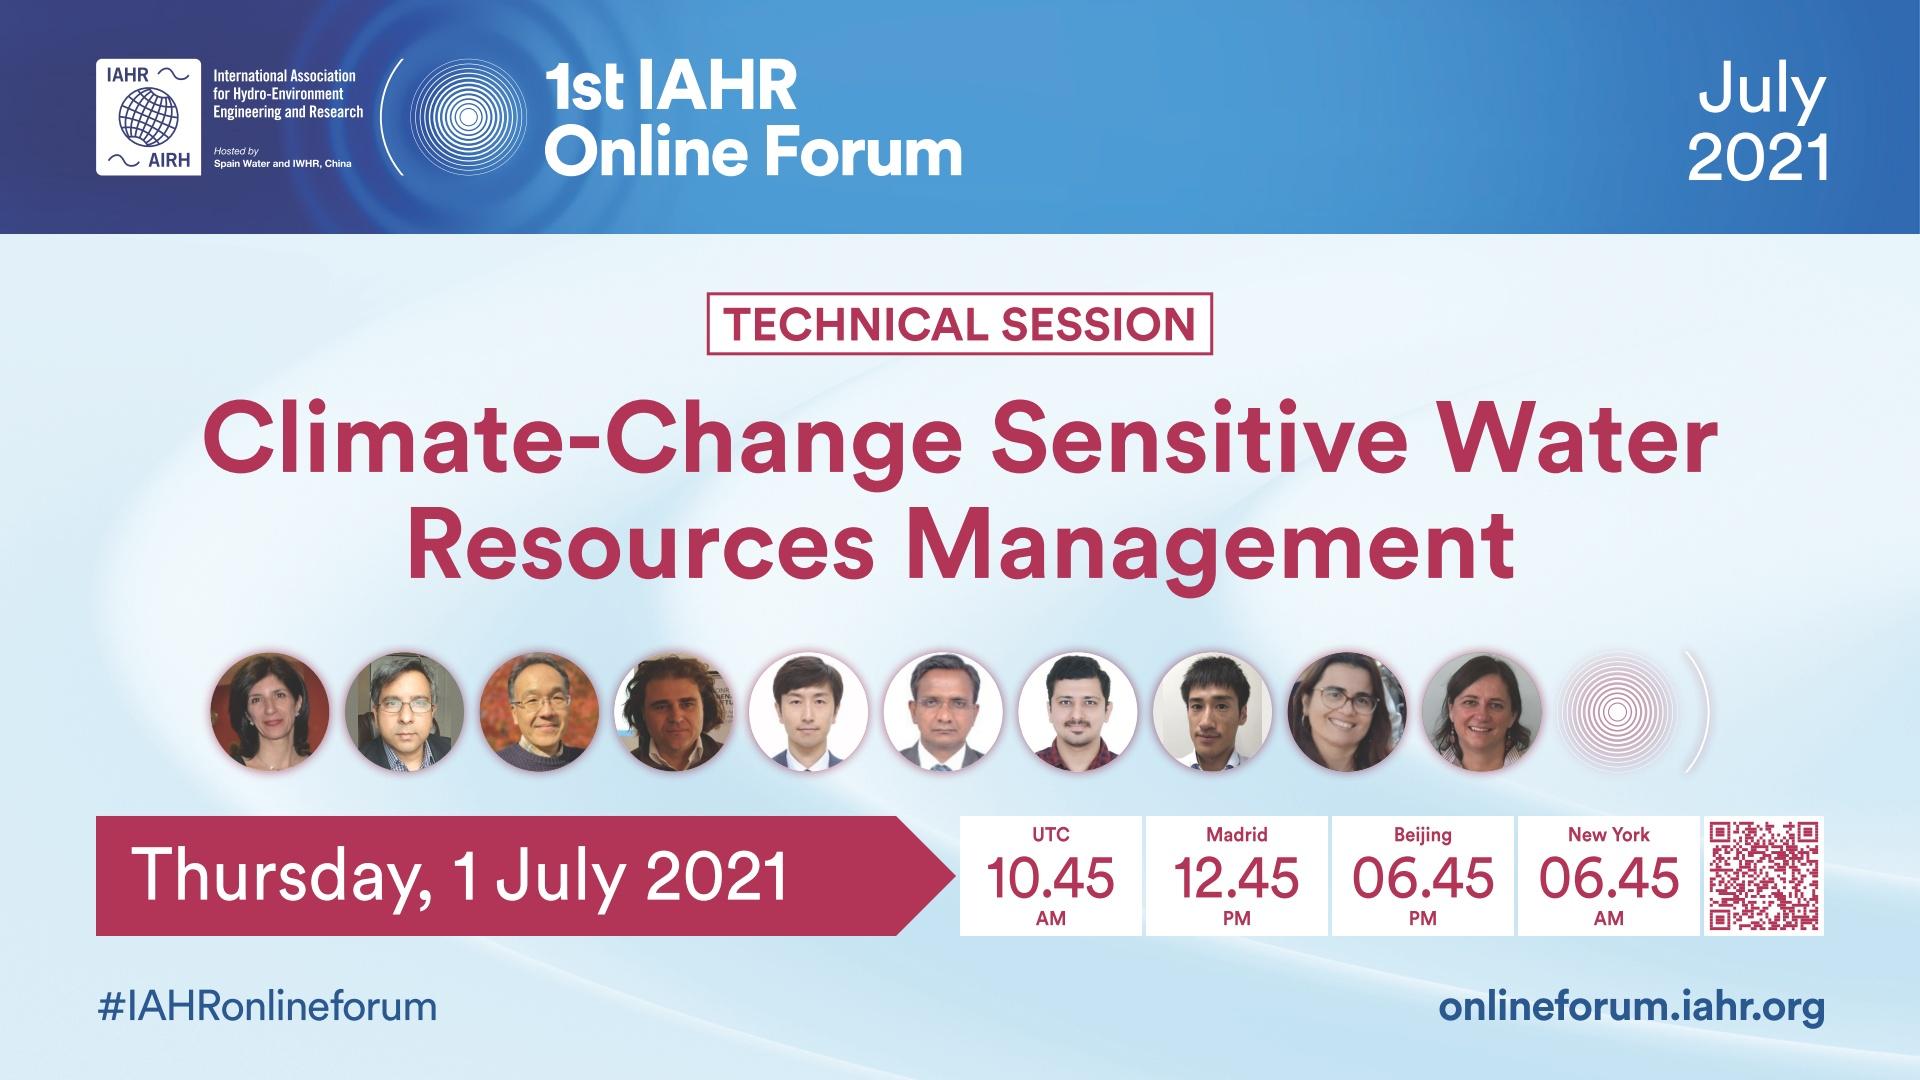 Climate-Change Sensitive Water Resources Management